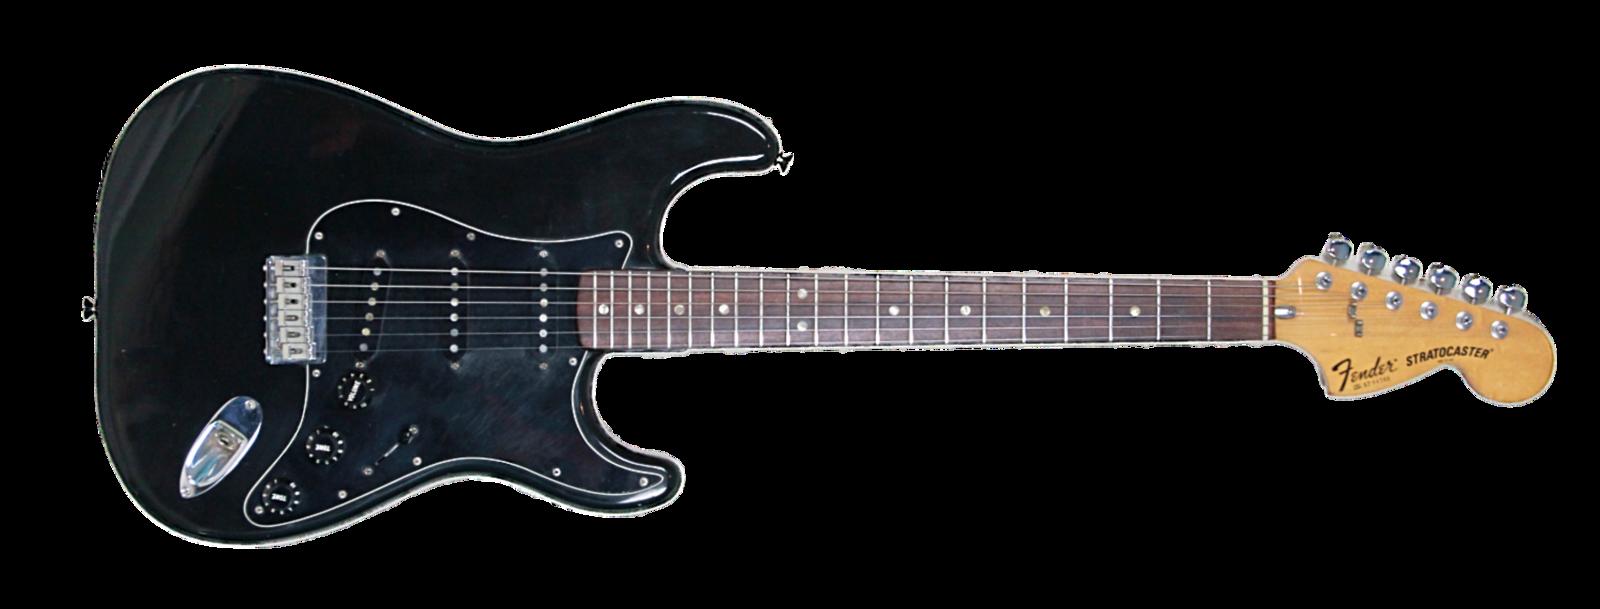 Guitar Pickups For Stratocaster : 1977 fender stratocaster vintage modern guitars ~ Vivirlamusica.com Haus und Dekorationen